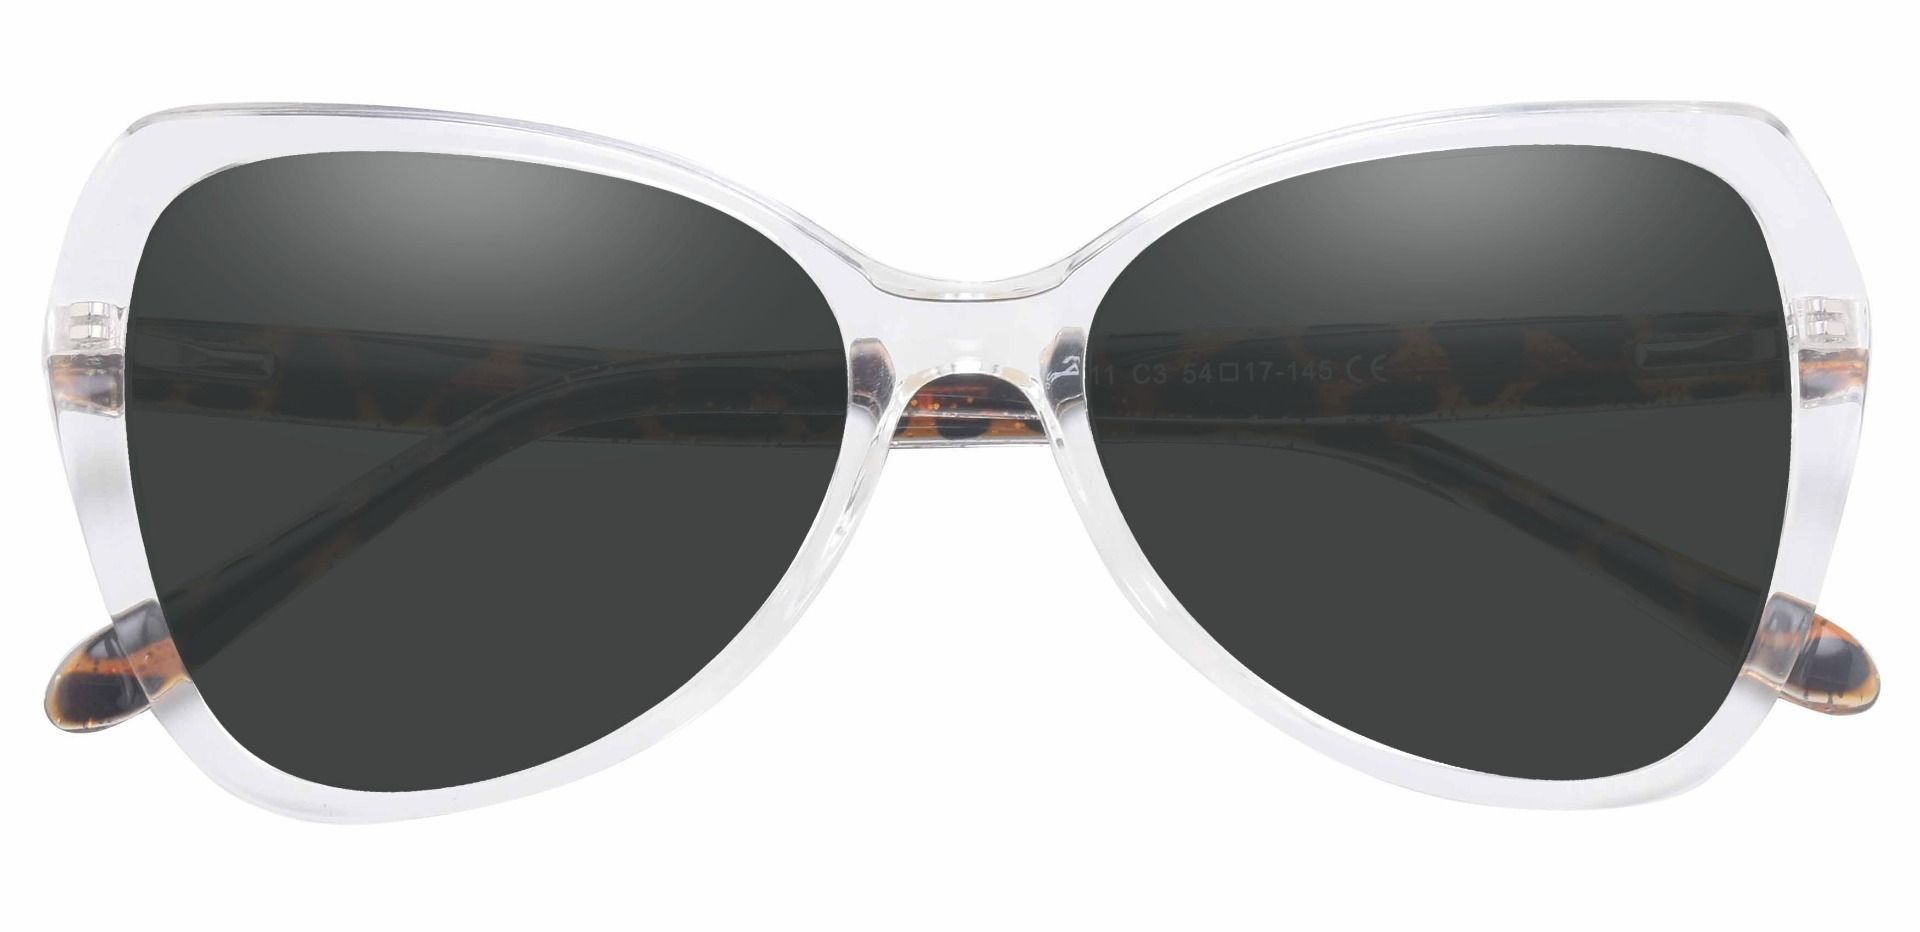 Kayla Geometric Prescription Sunglasses - Clear Frame With Gray Lenses